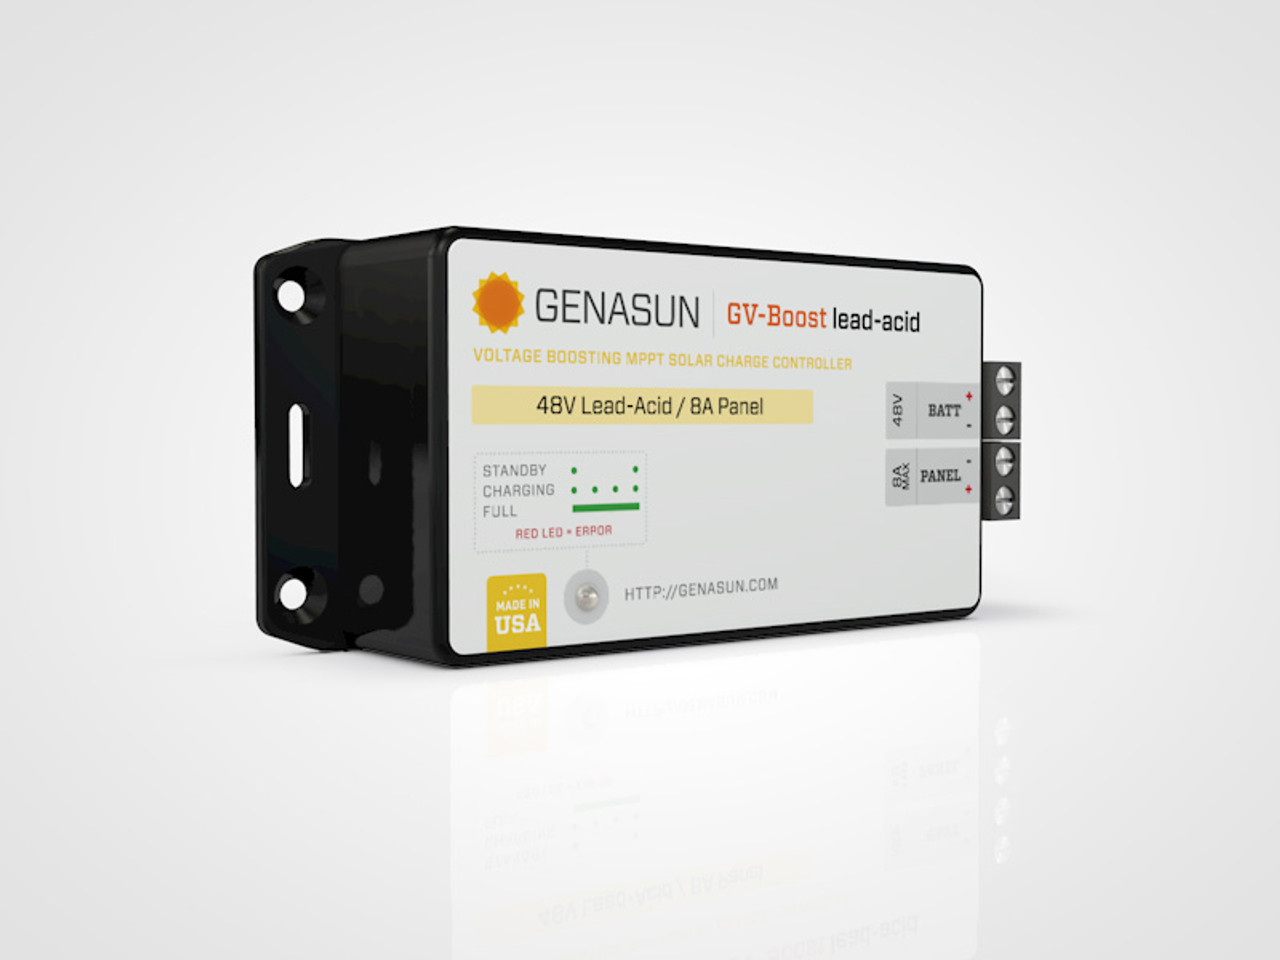 GVB-8   105W 8A 12V Genasun MPPT Boost Solar Charge Controller - Pb - Left2